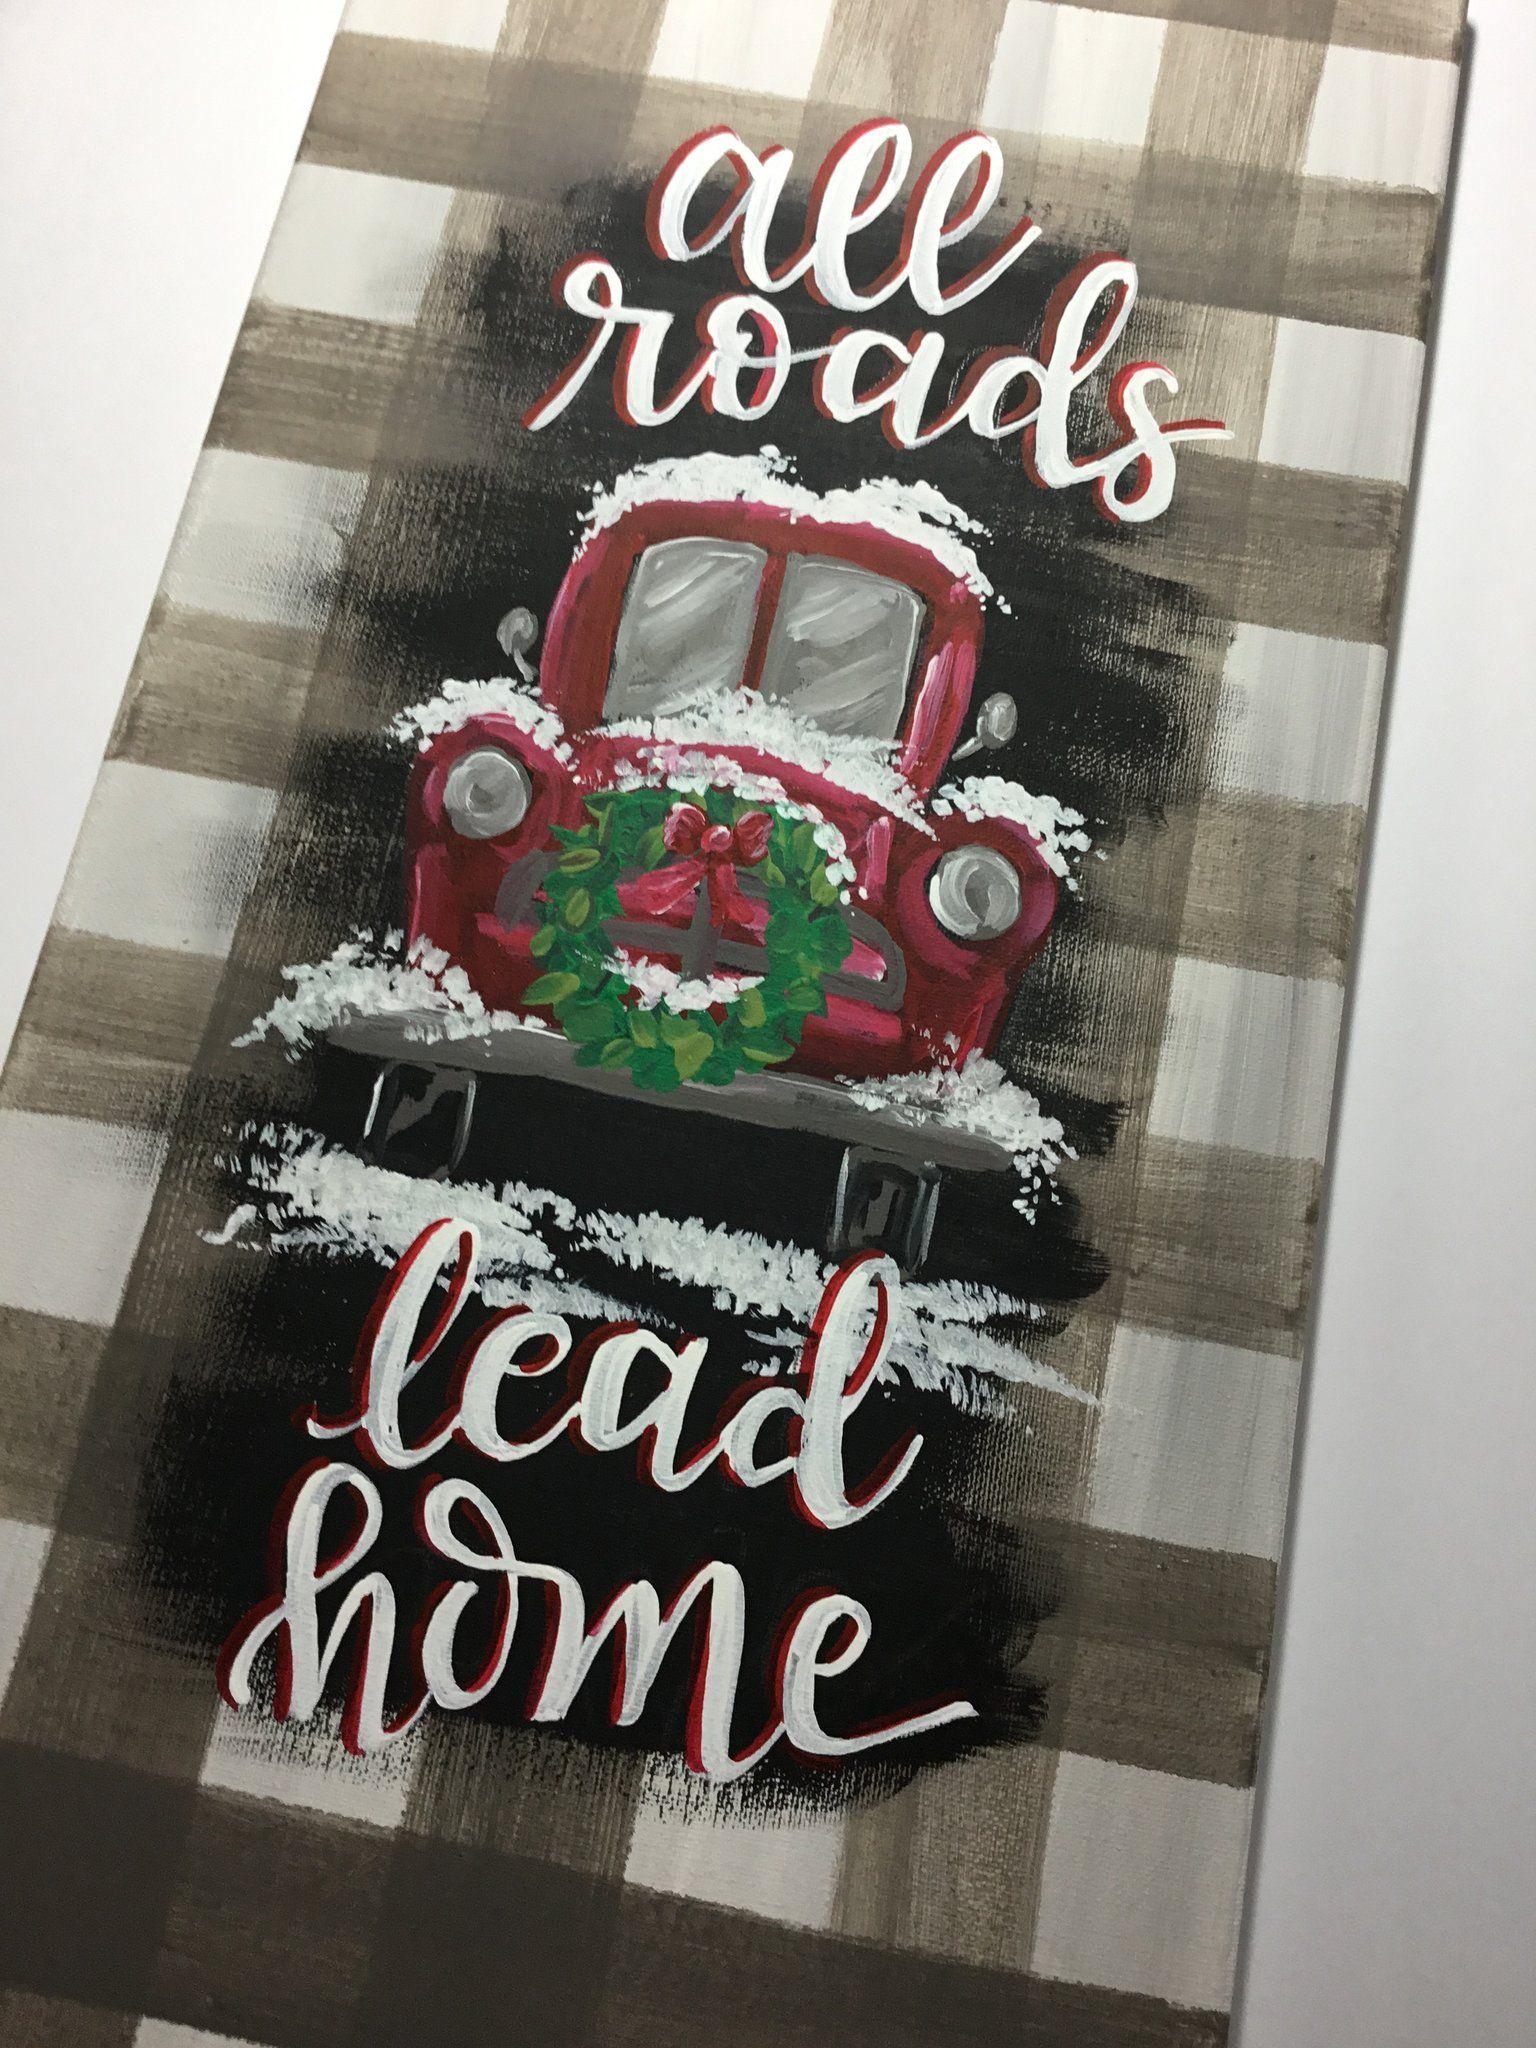 All Roads Lead Home Lyrics - Golden State - FlashLyrics